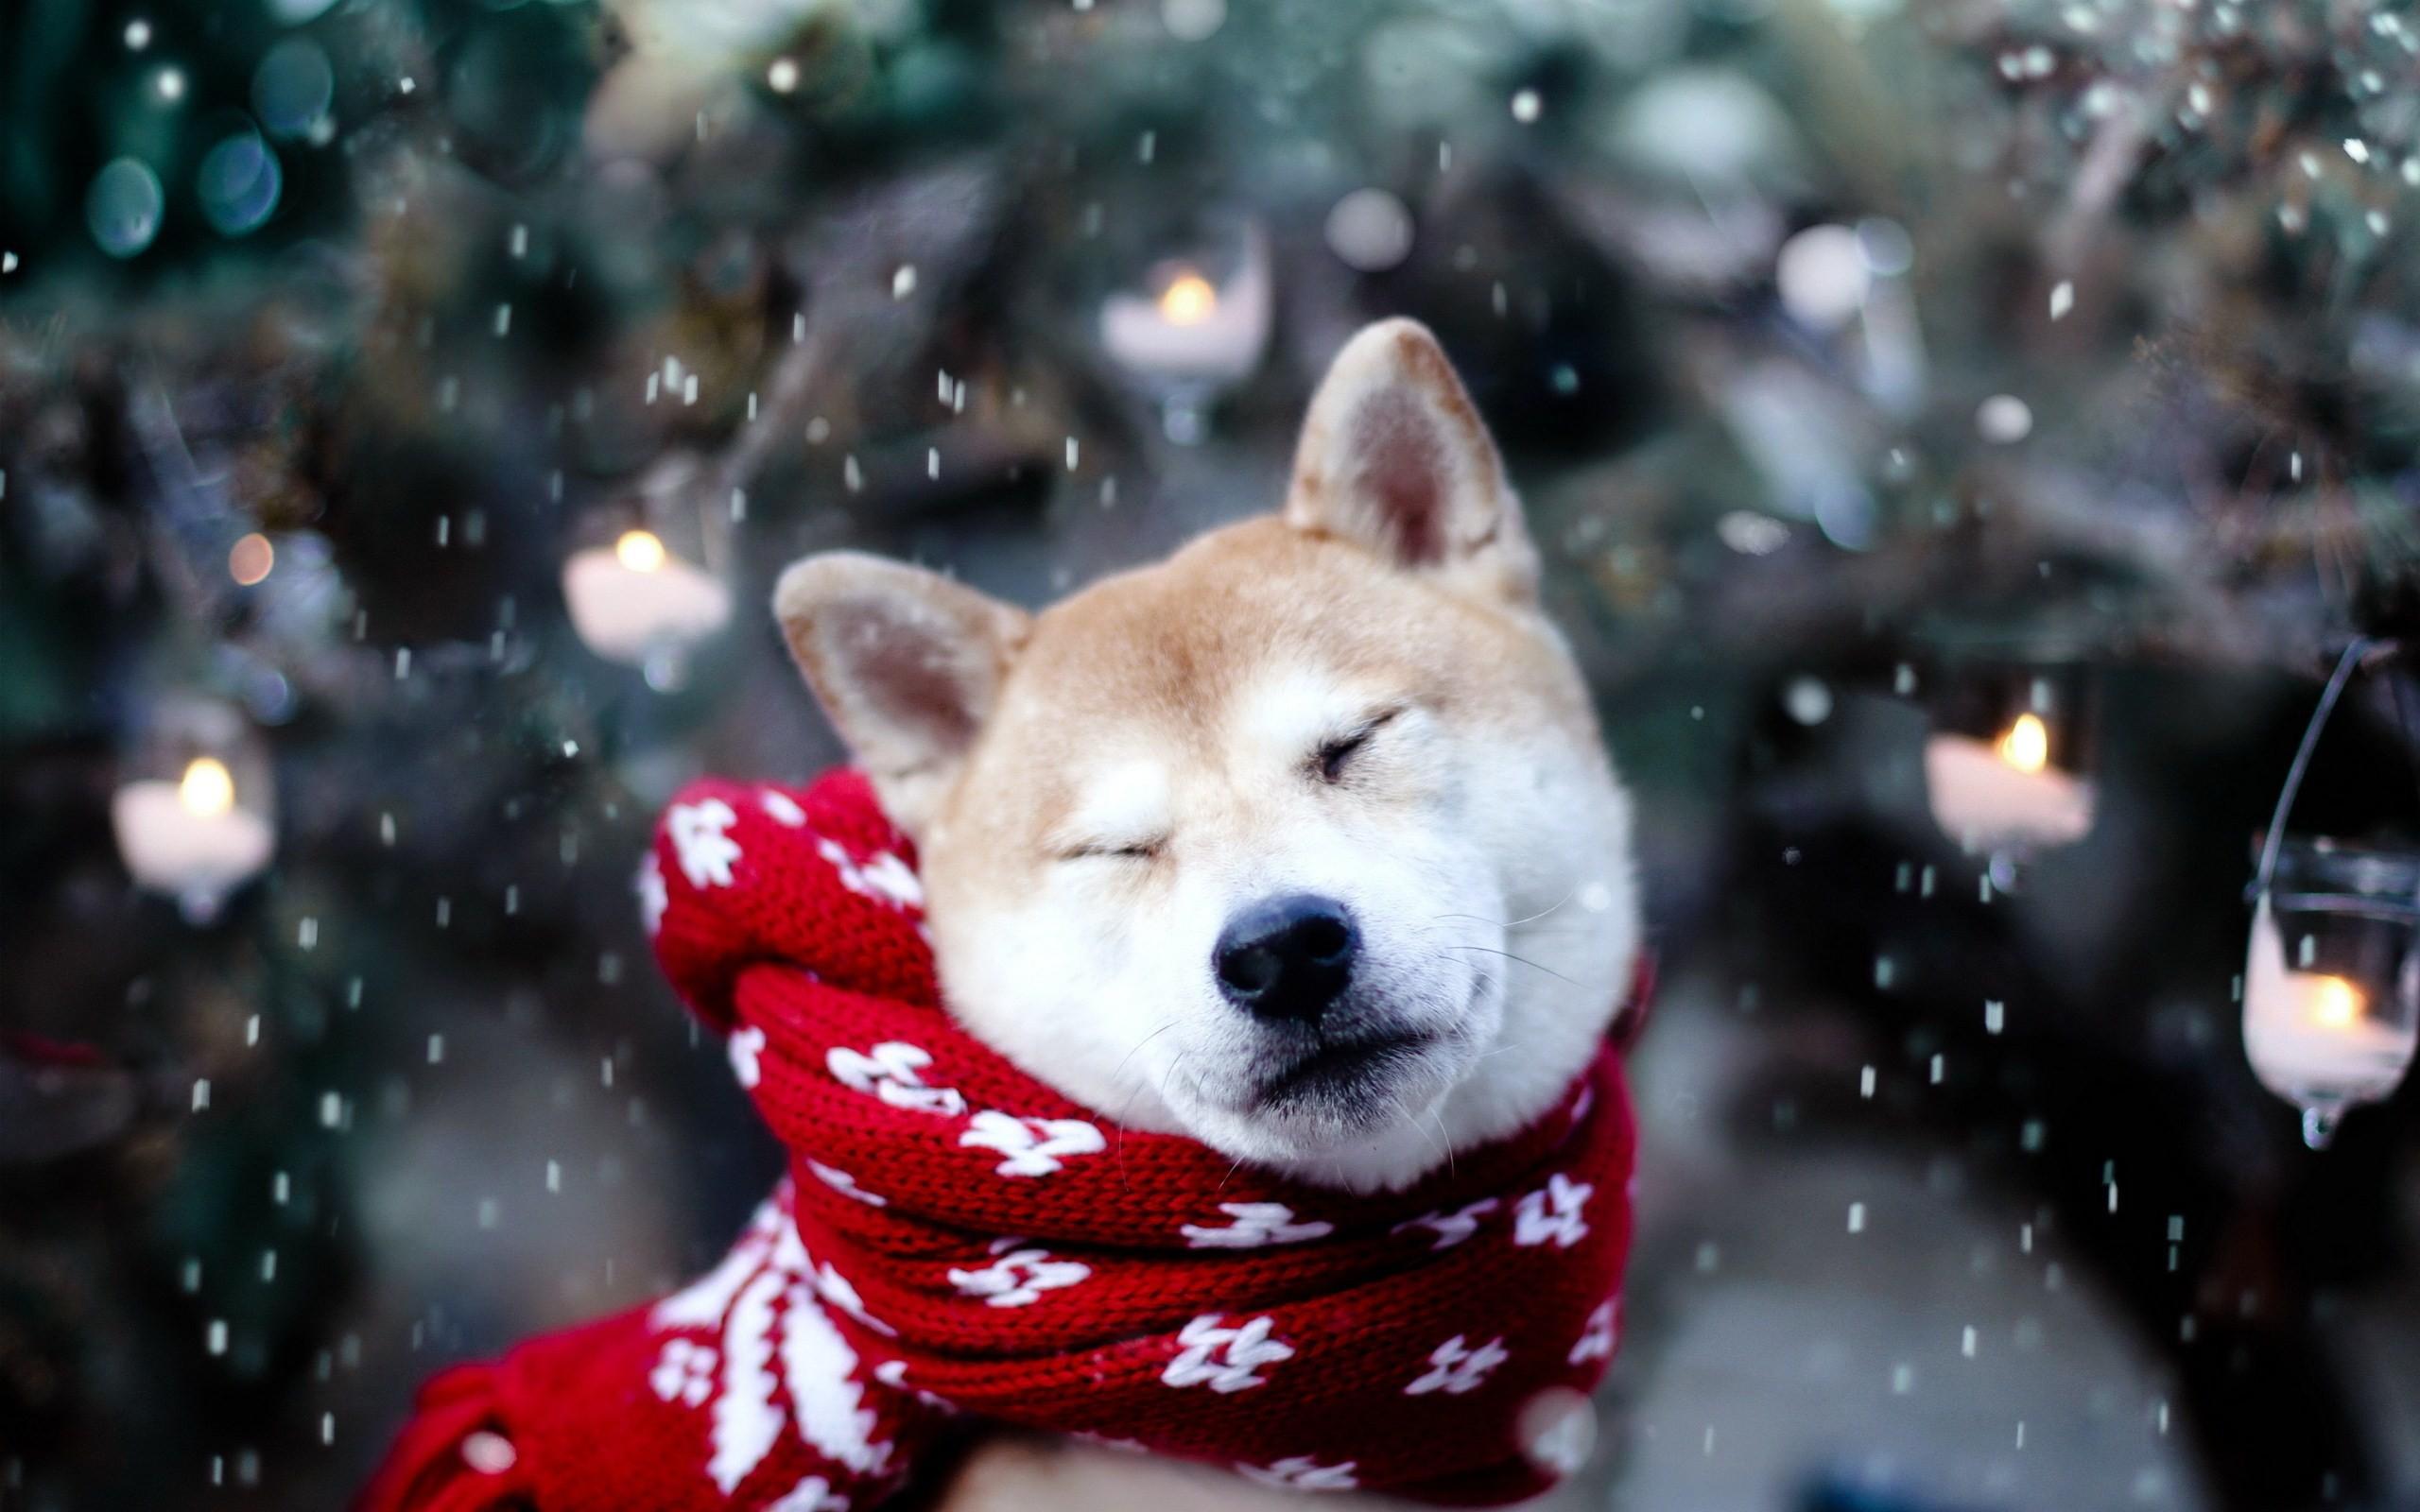 cute dog, winter, snowflakes, animal photos, mood, wallpaper